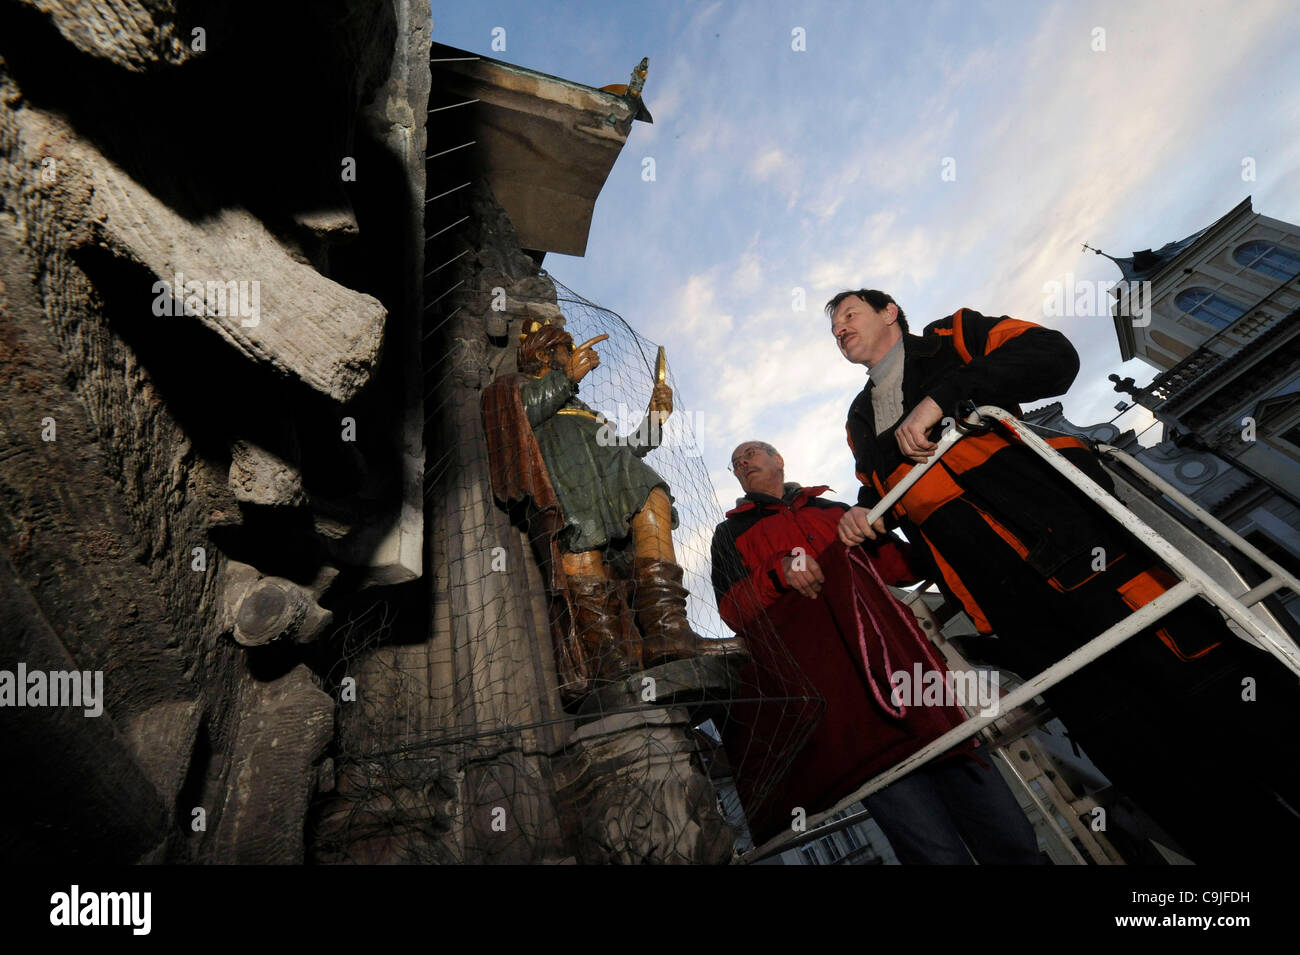 Prague, Czech Republic. 13th Jan, 2012. Restorers remove sculptures from Prague's Astronomical clock in the - Stock Image